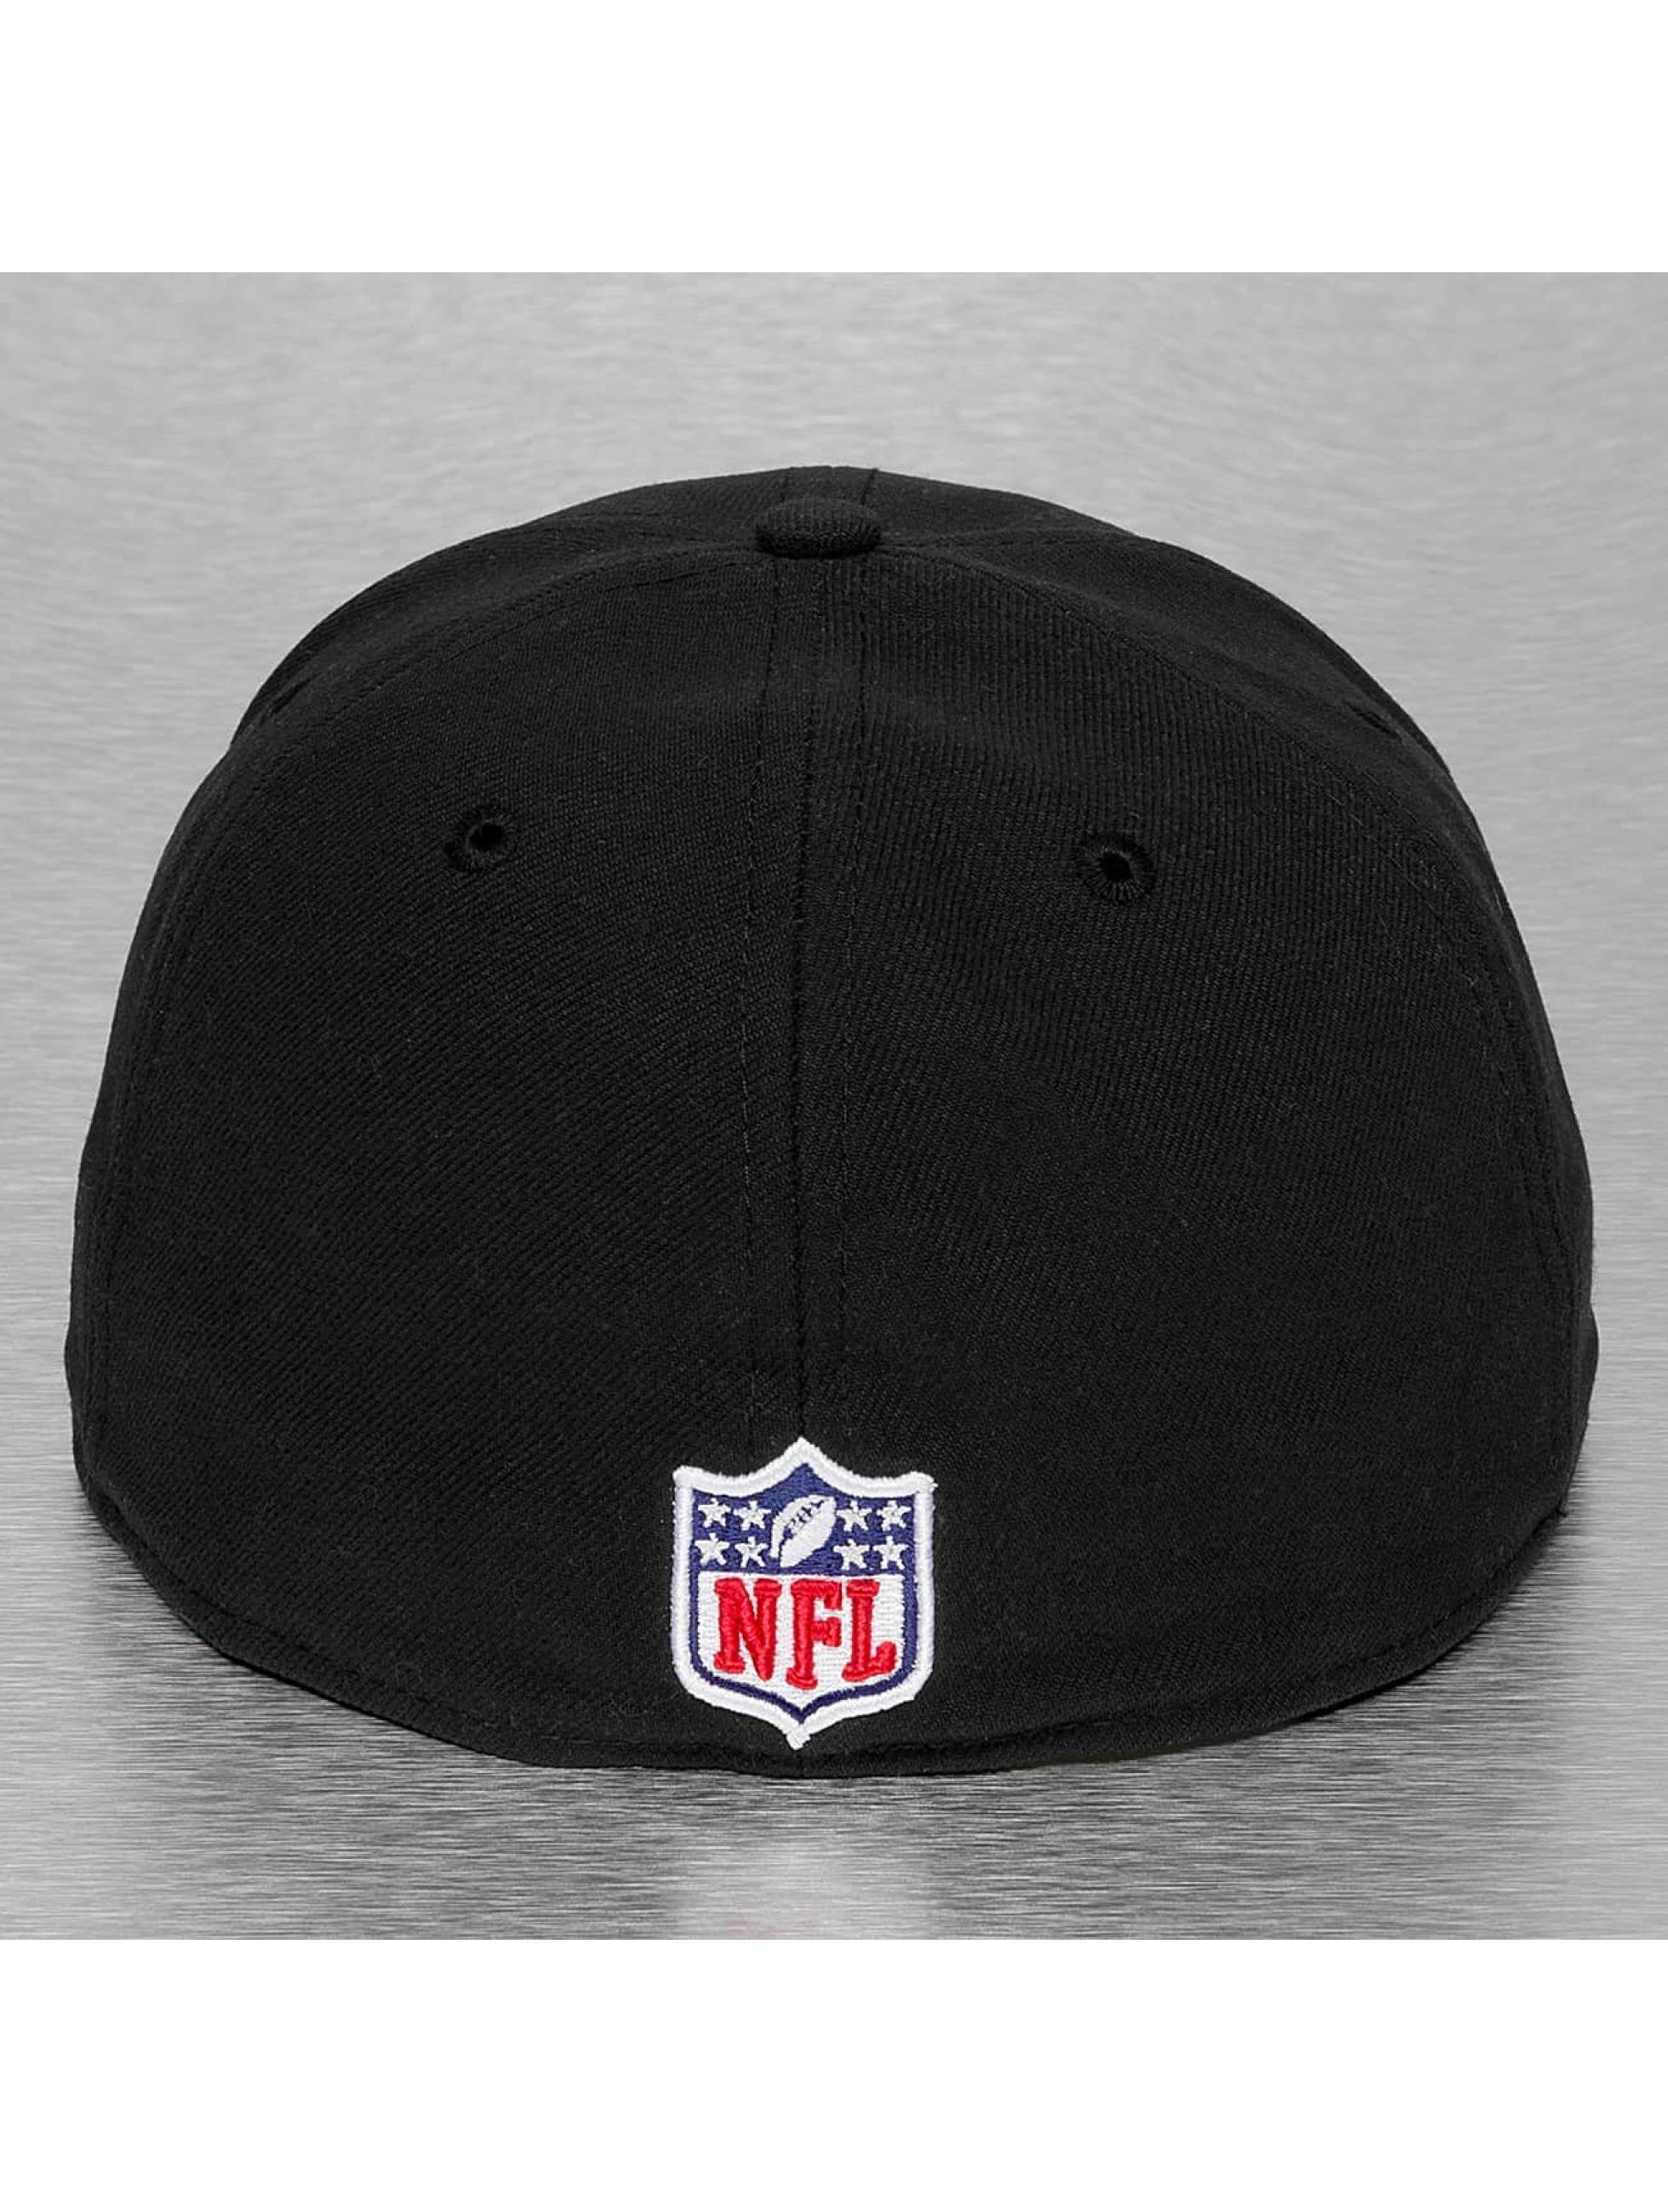 New Era Бейсболка NFL On Field Oakland Raiders 59Fifty черный